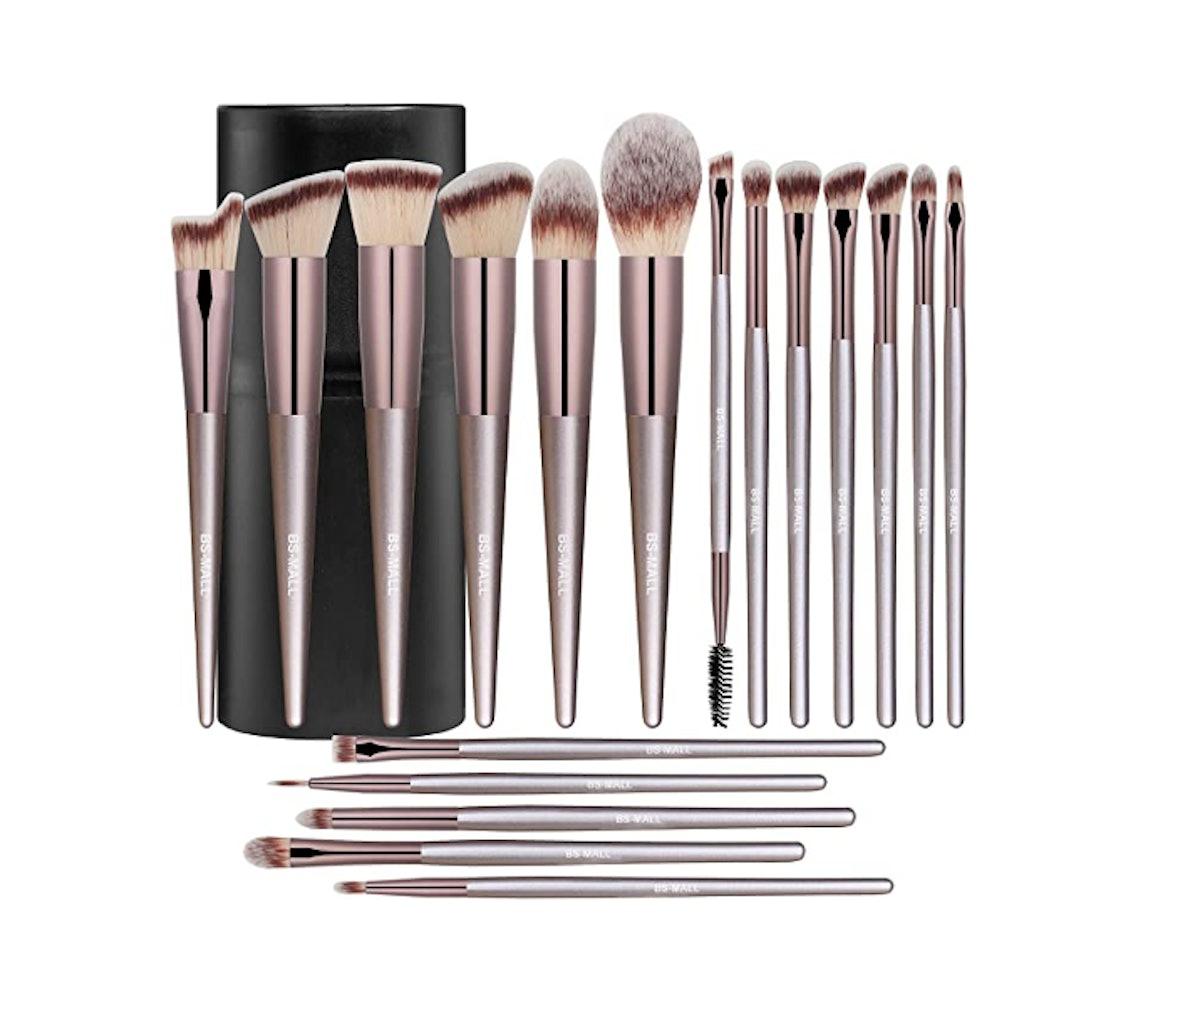 BS-MALL Makeup Brush (18 Pieces)